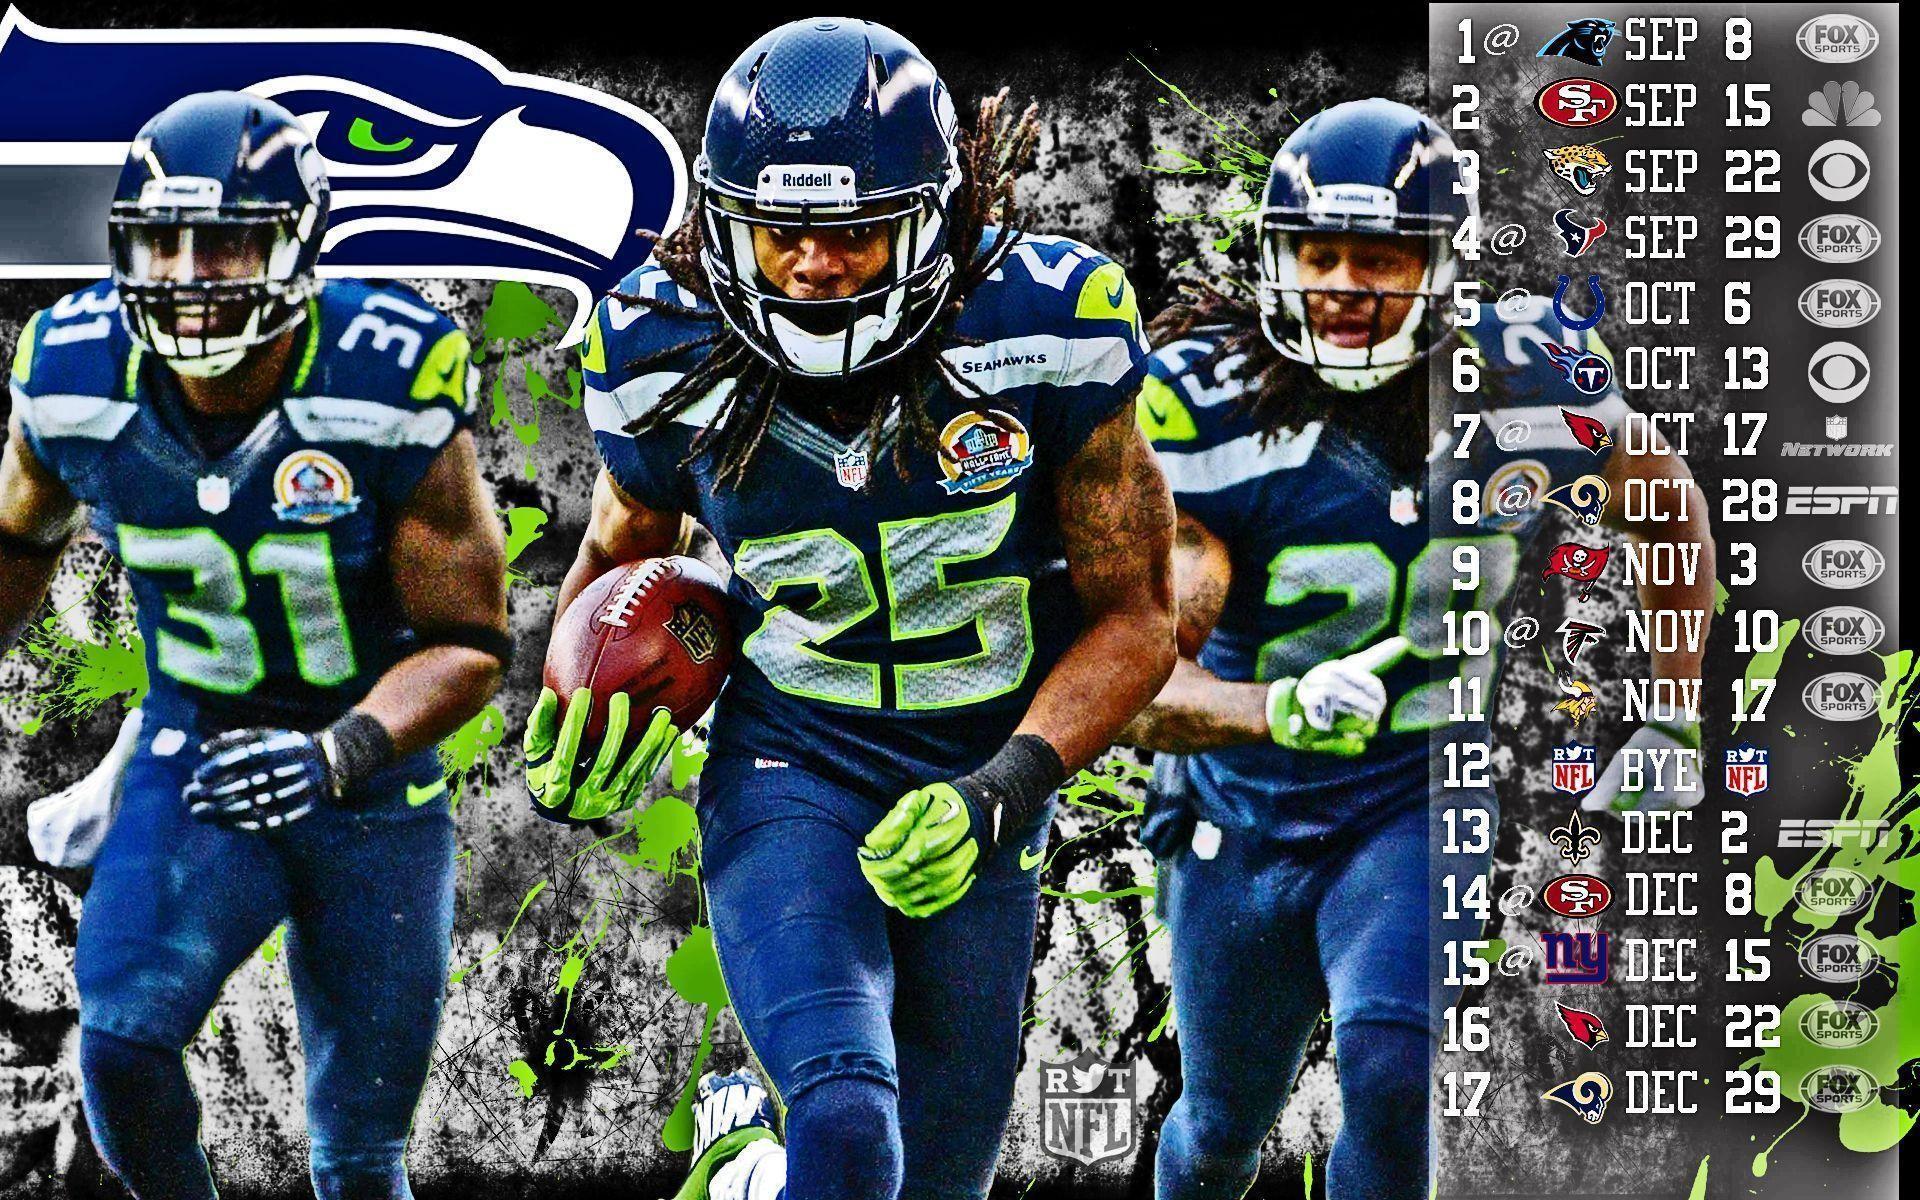 Seahawks Screensaver – wallpaper hd